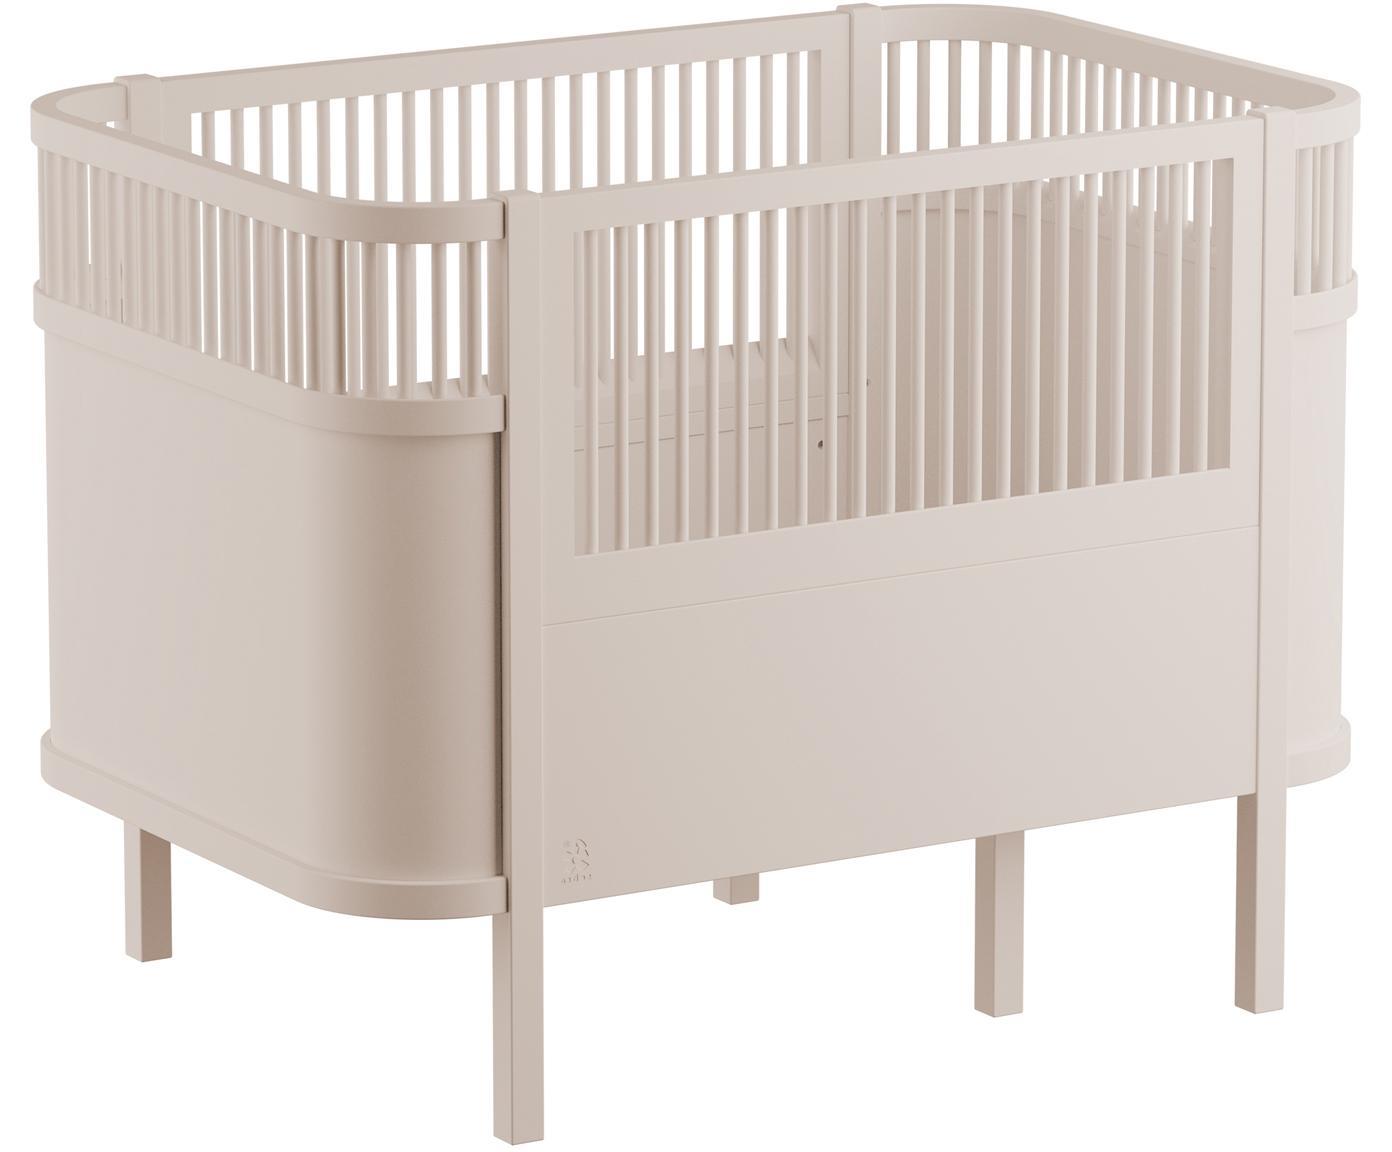 Babybed Junior, Gelakt berkenhout, Beige, 115 x 88 cm